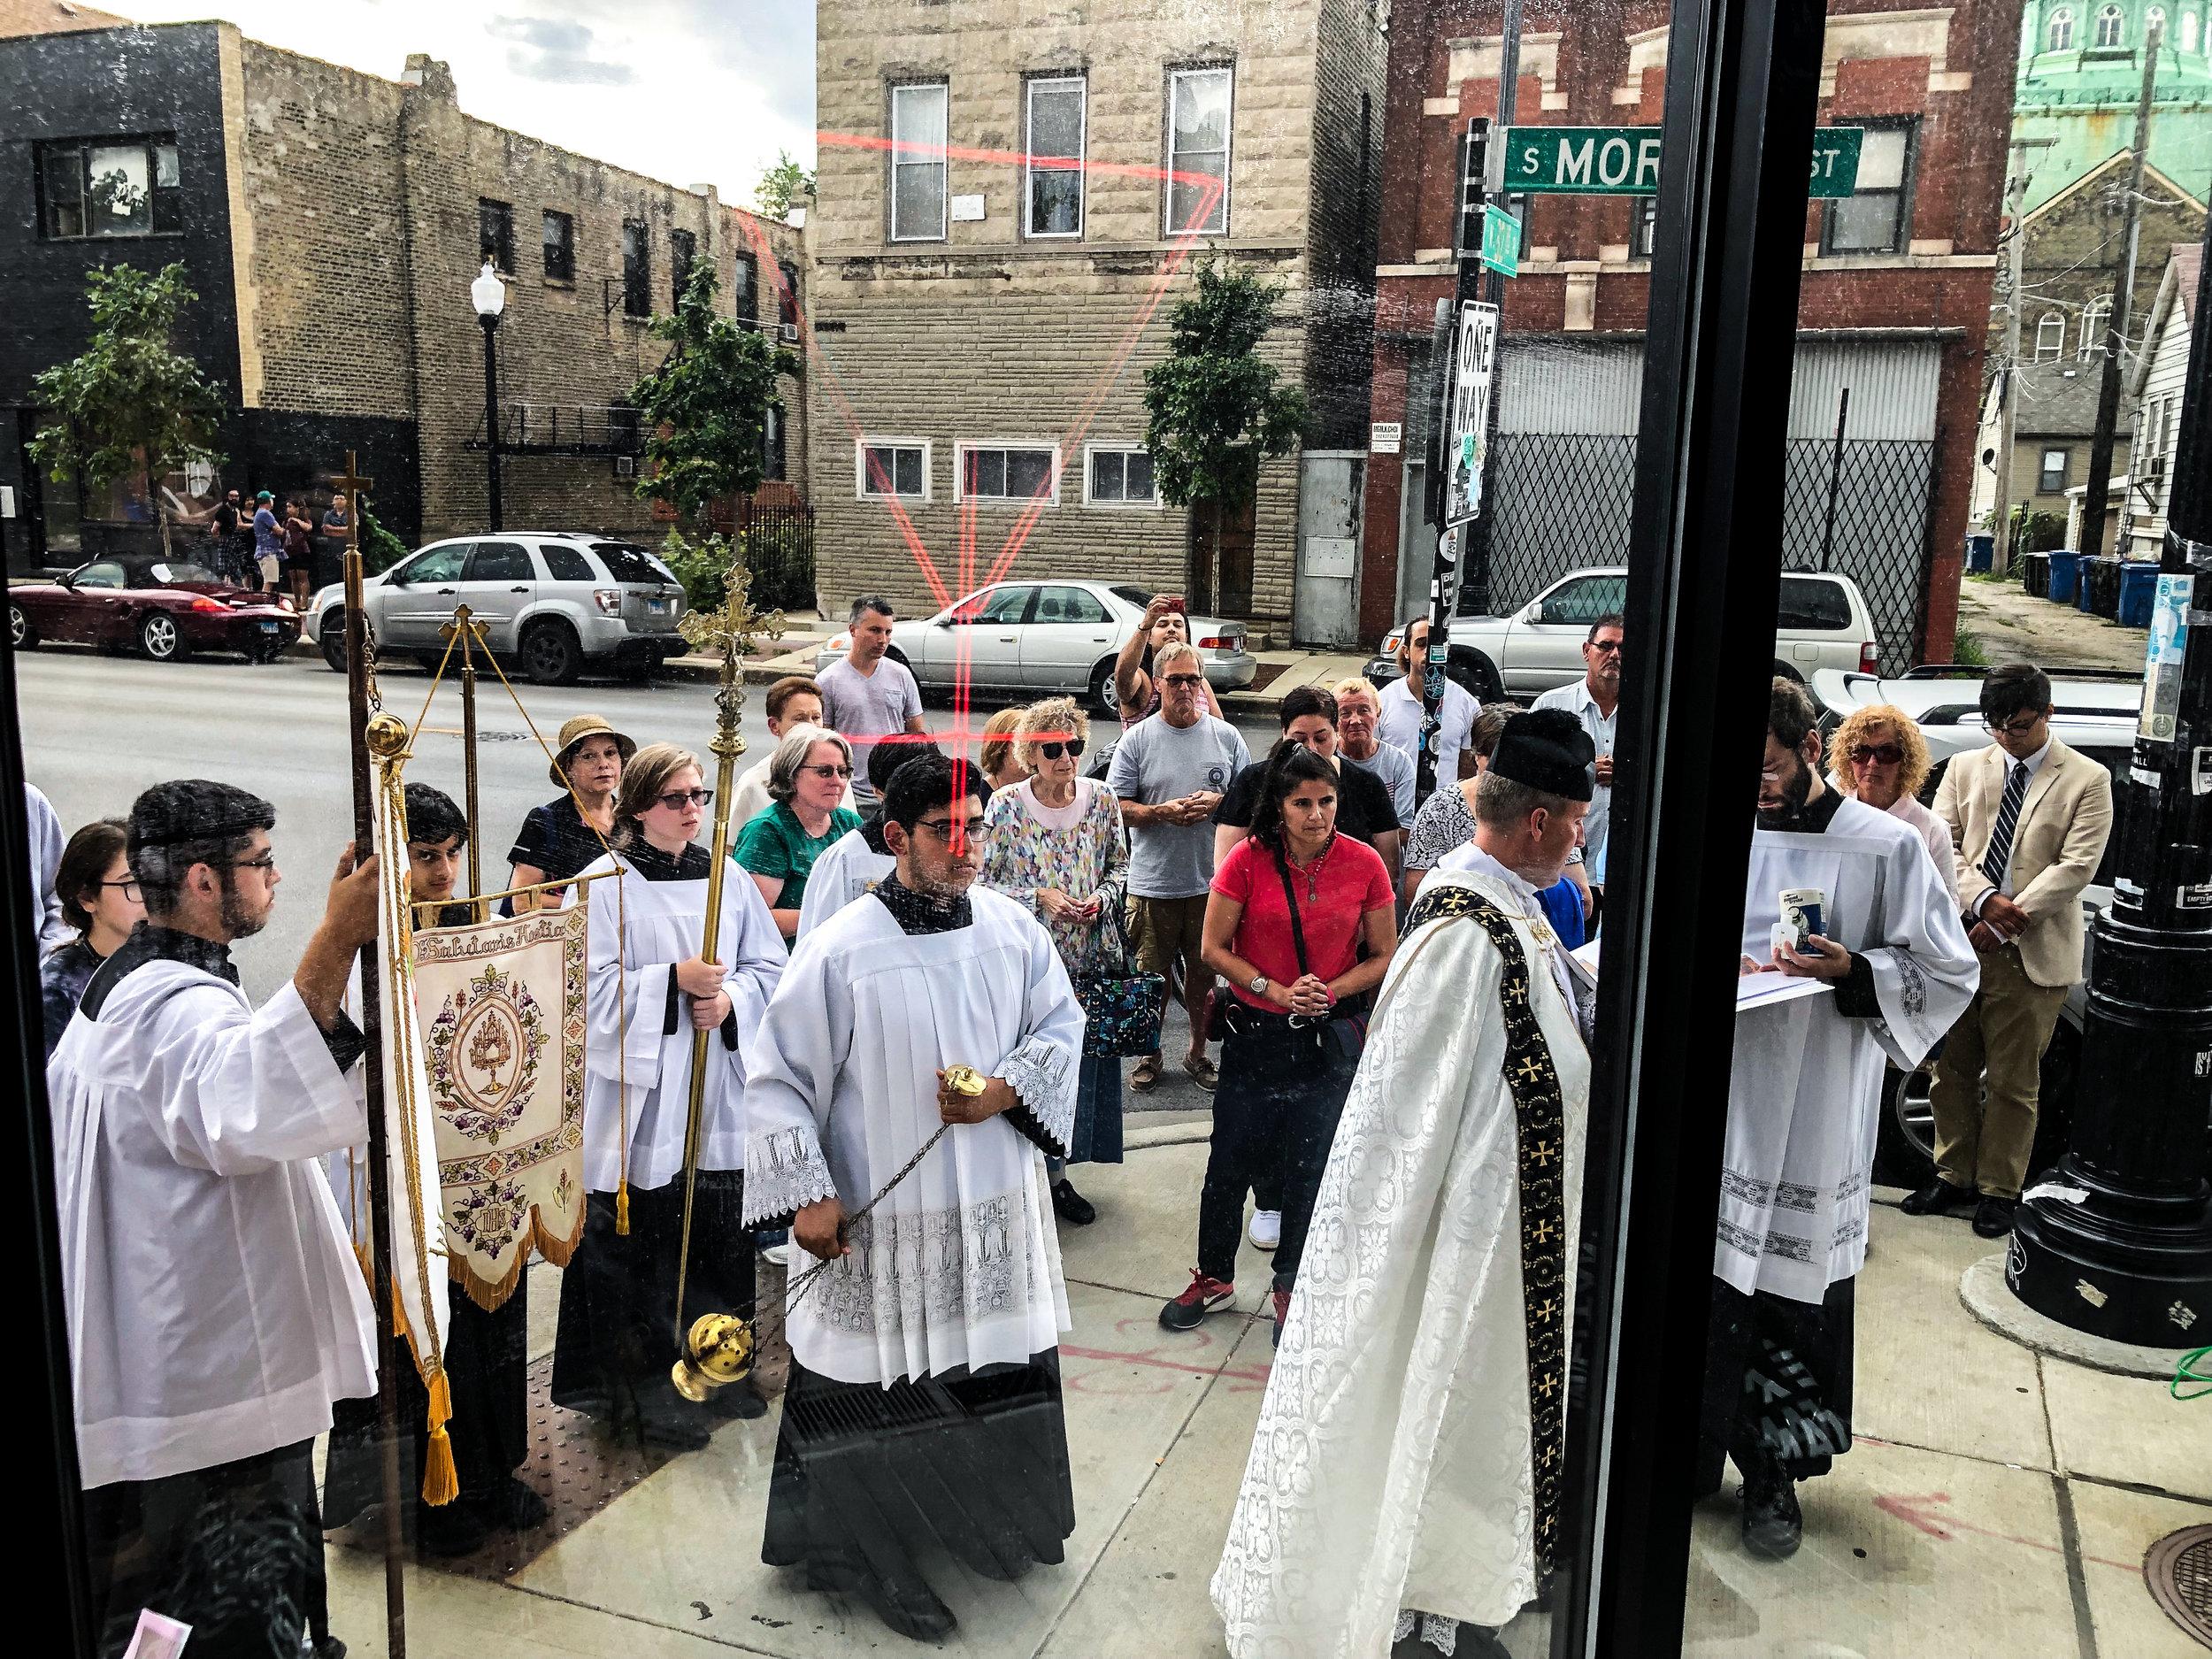 Catholic Church, unannounced protest.